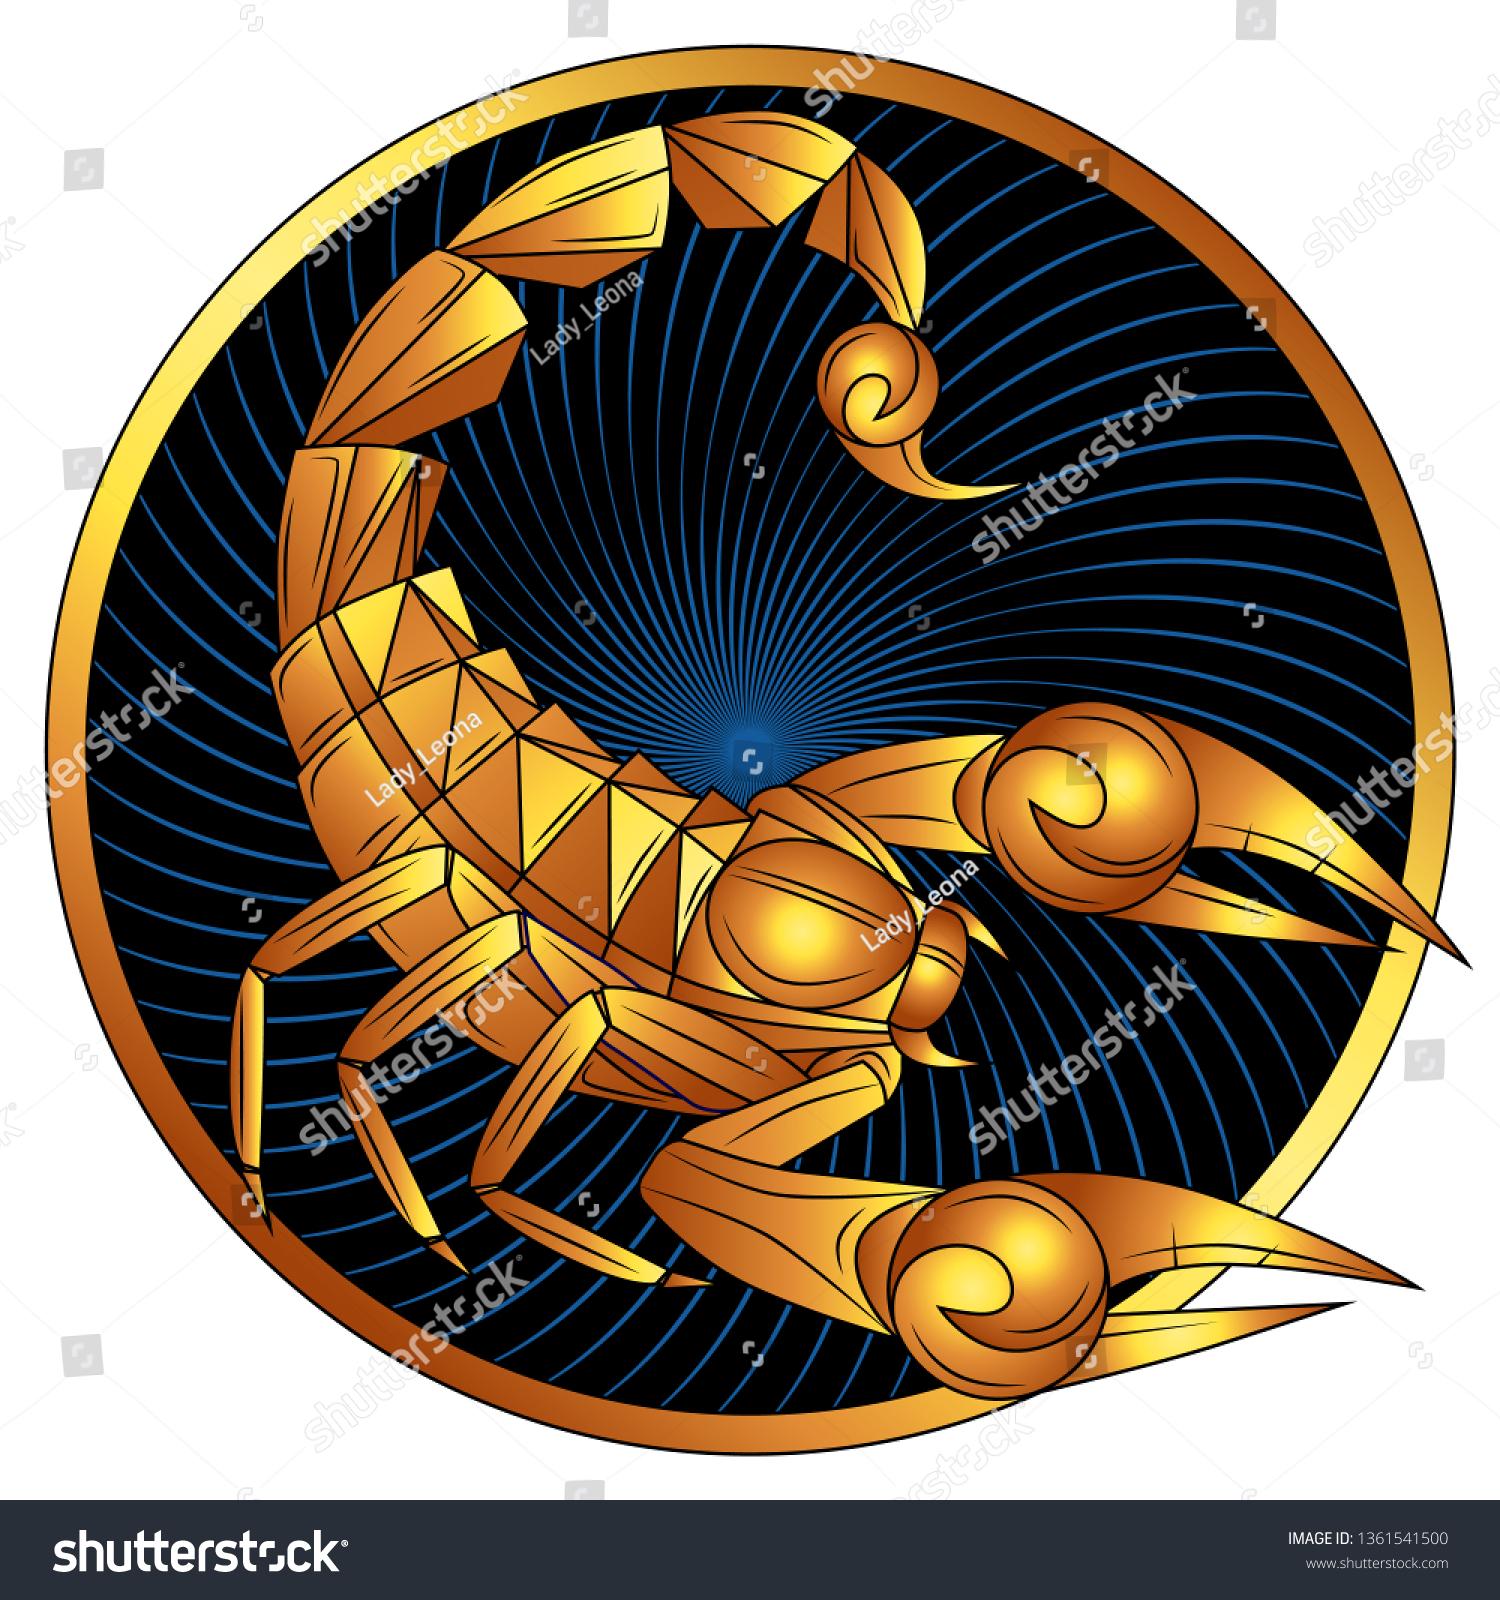 Dibujo De Un Escorpion Dorado vector de stock (libre de regalías) sobre signo de oro